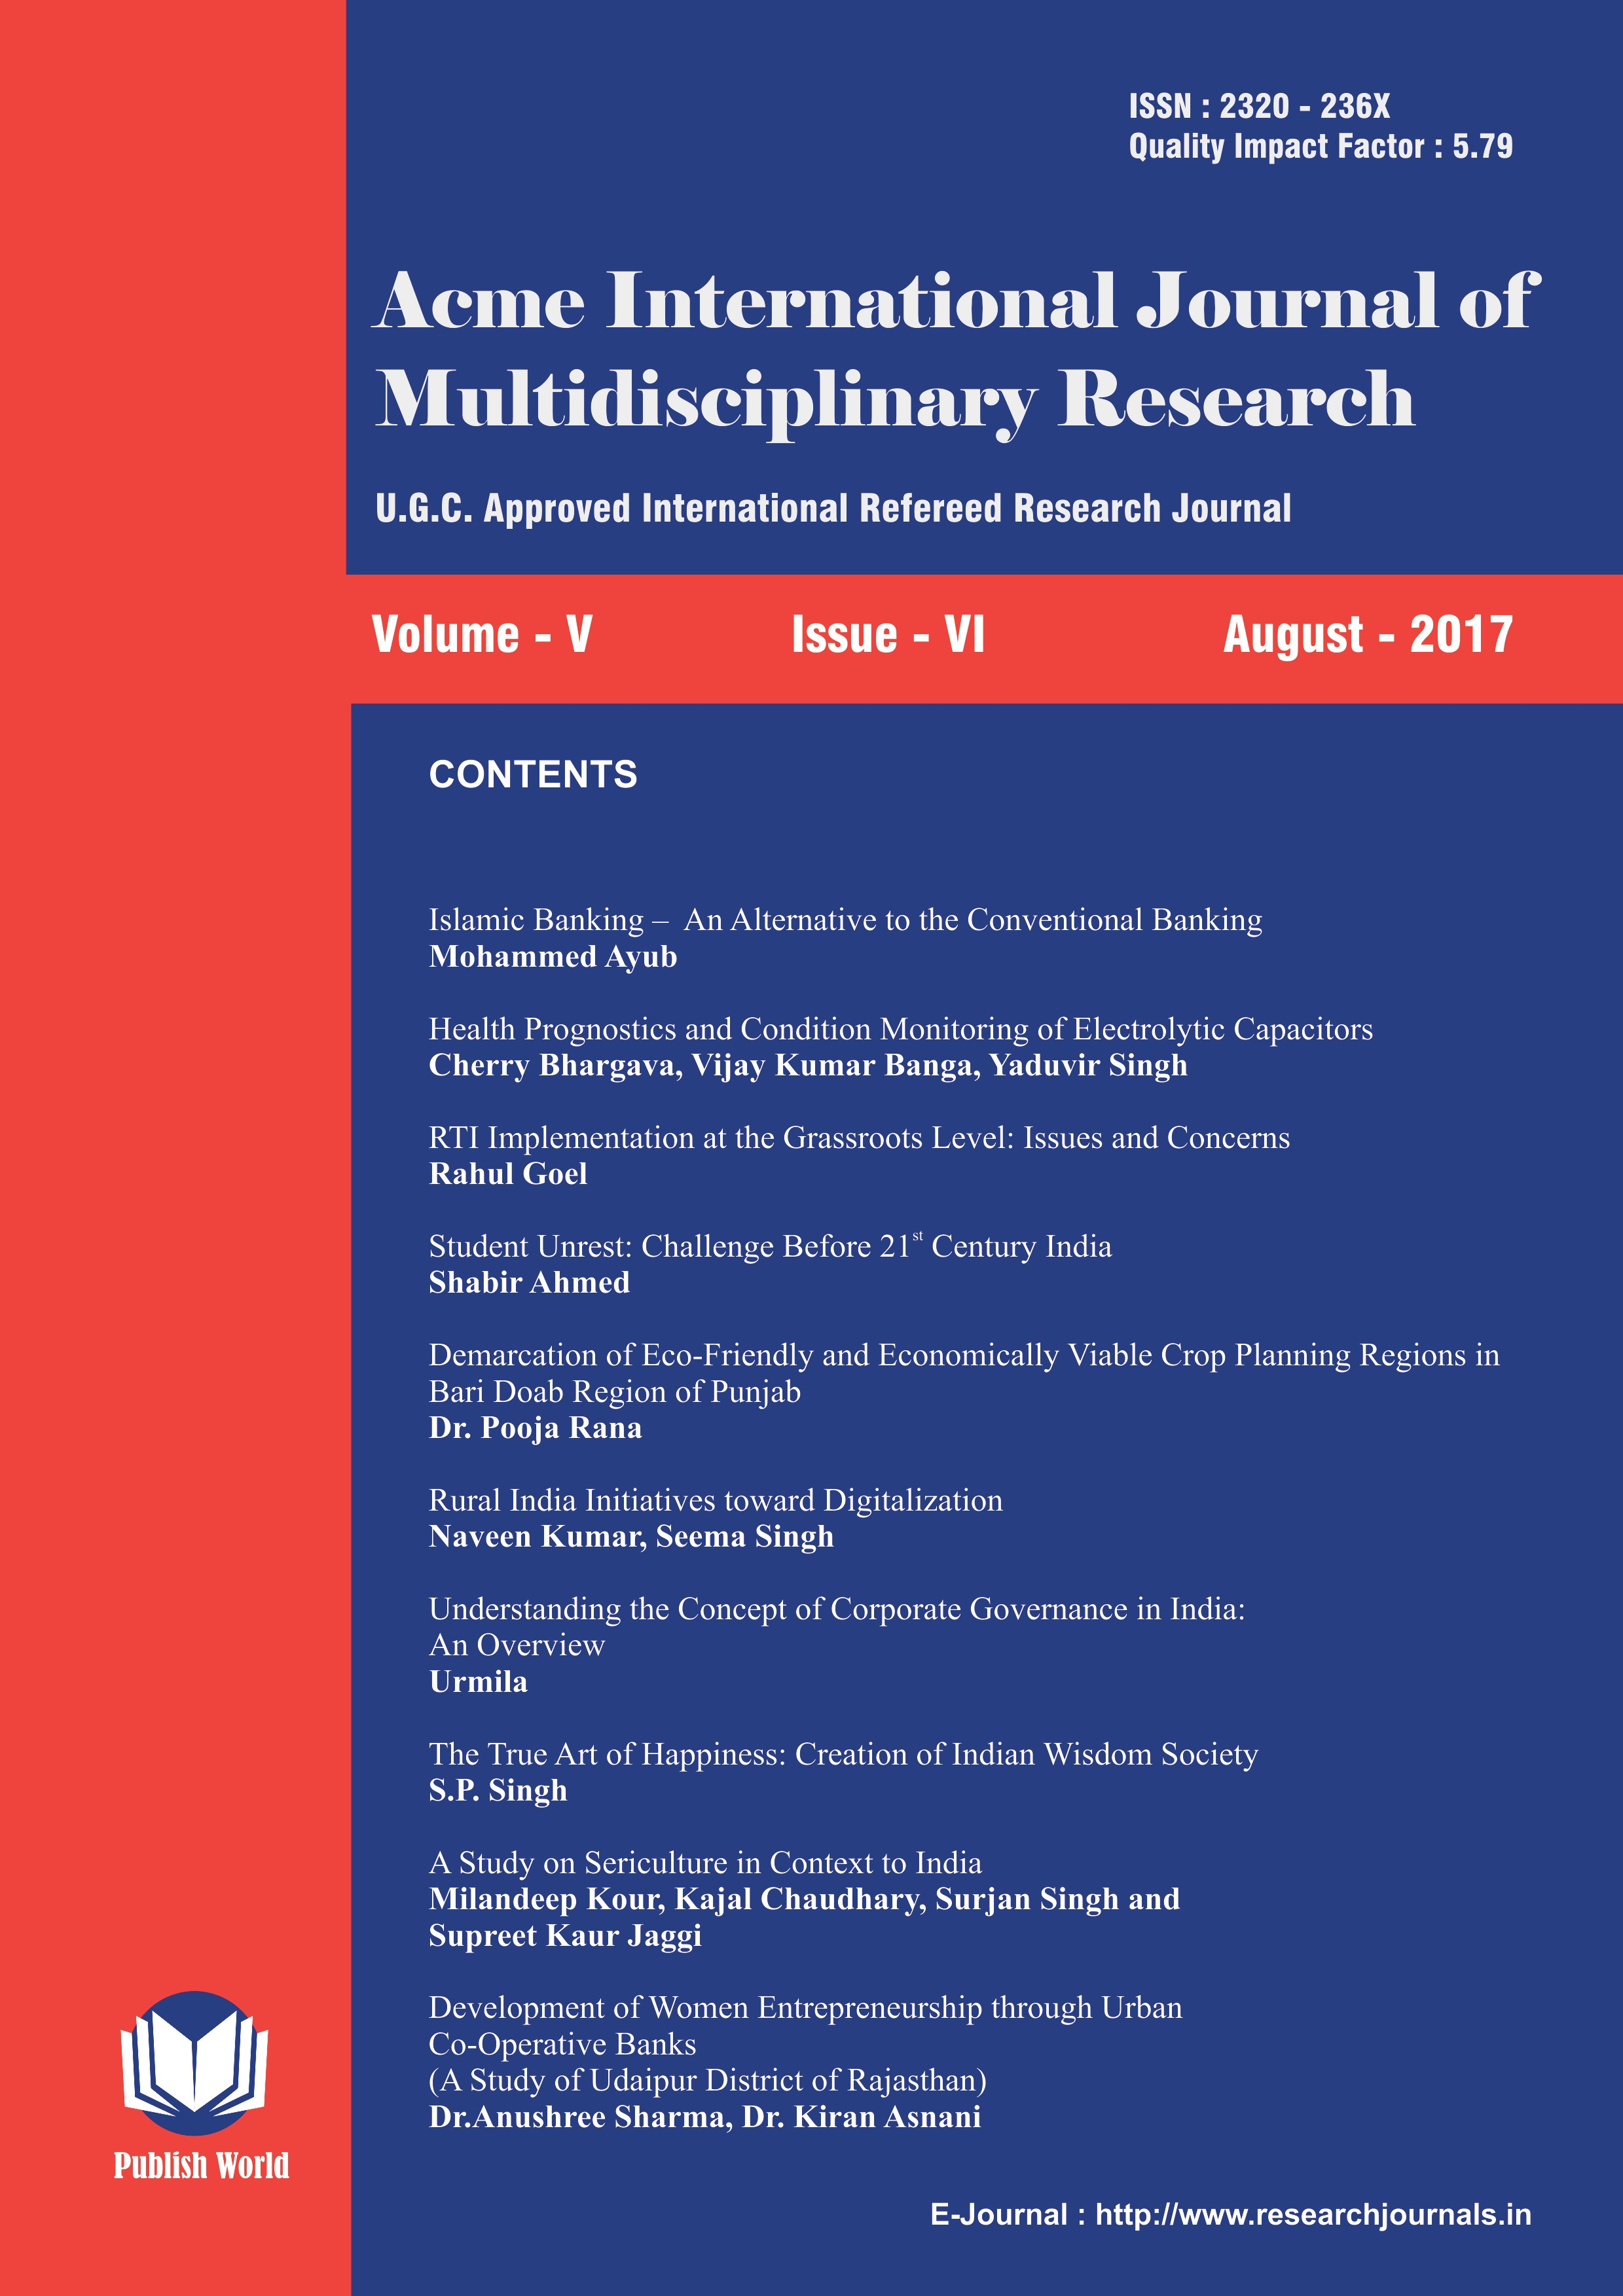 Acme International Journal of Multidisciplinary Research : August